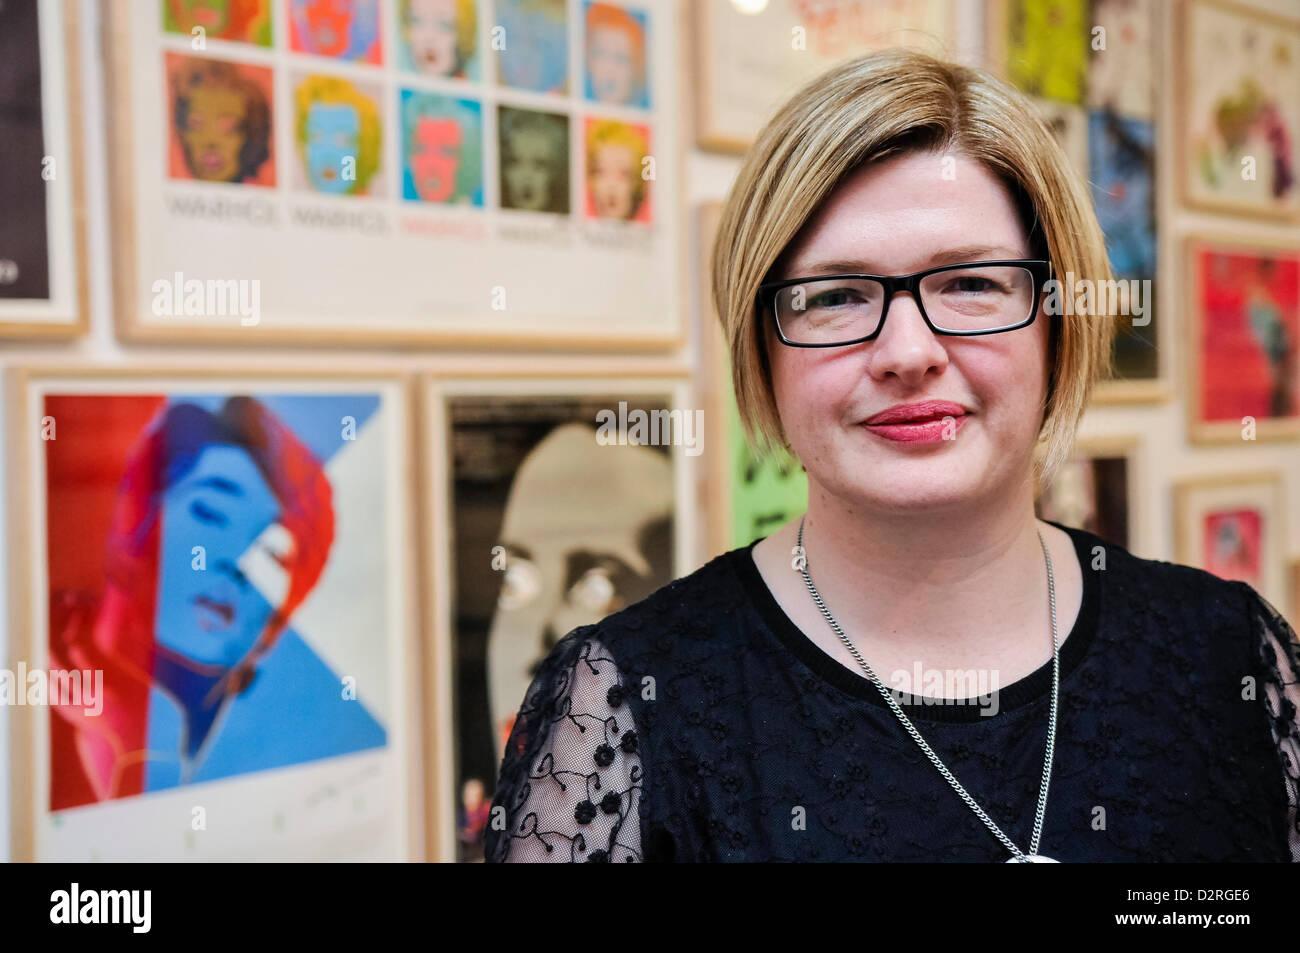 31st January 2013, Belfast, Northern Ireland.  Gillian Mitchell, Director of Programmes at the Metropolitan Arts - Stock Image